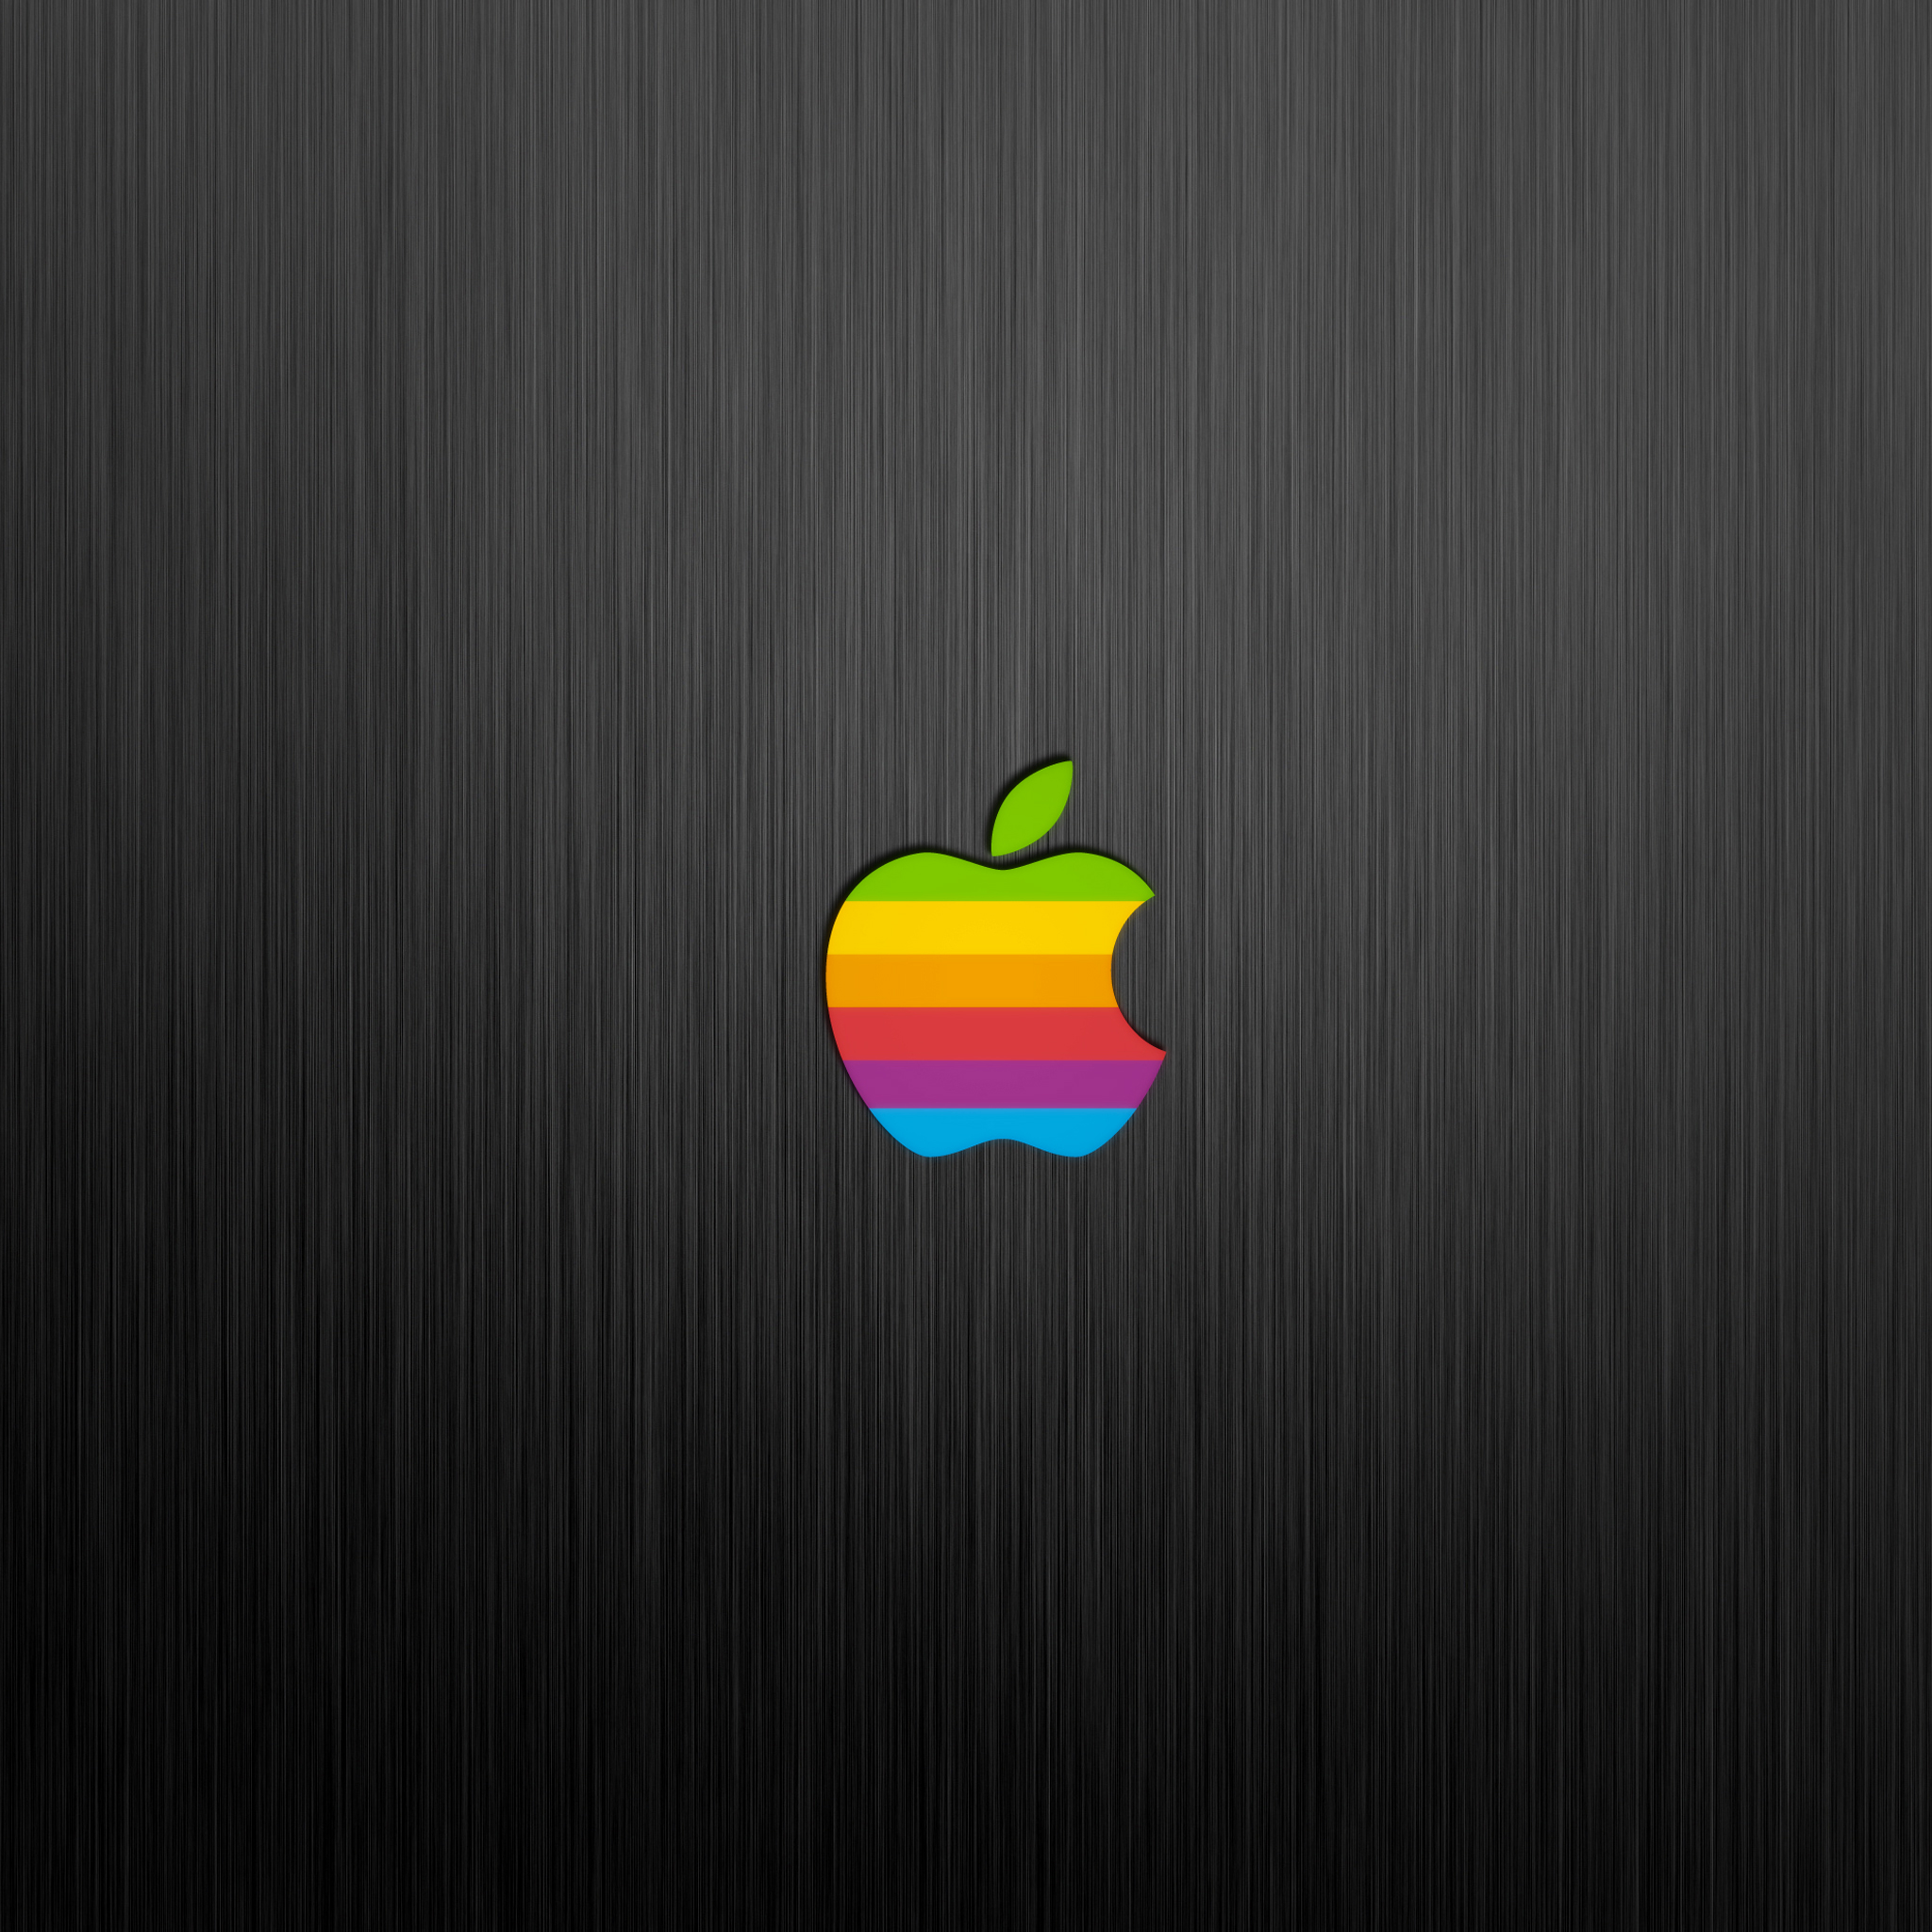 Apple-Classic-3Wallpapers-iPad-Retina